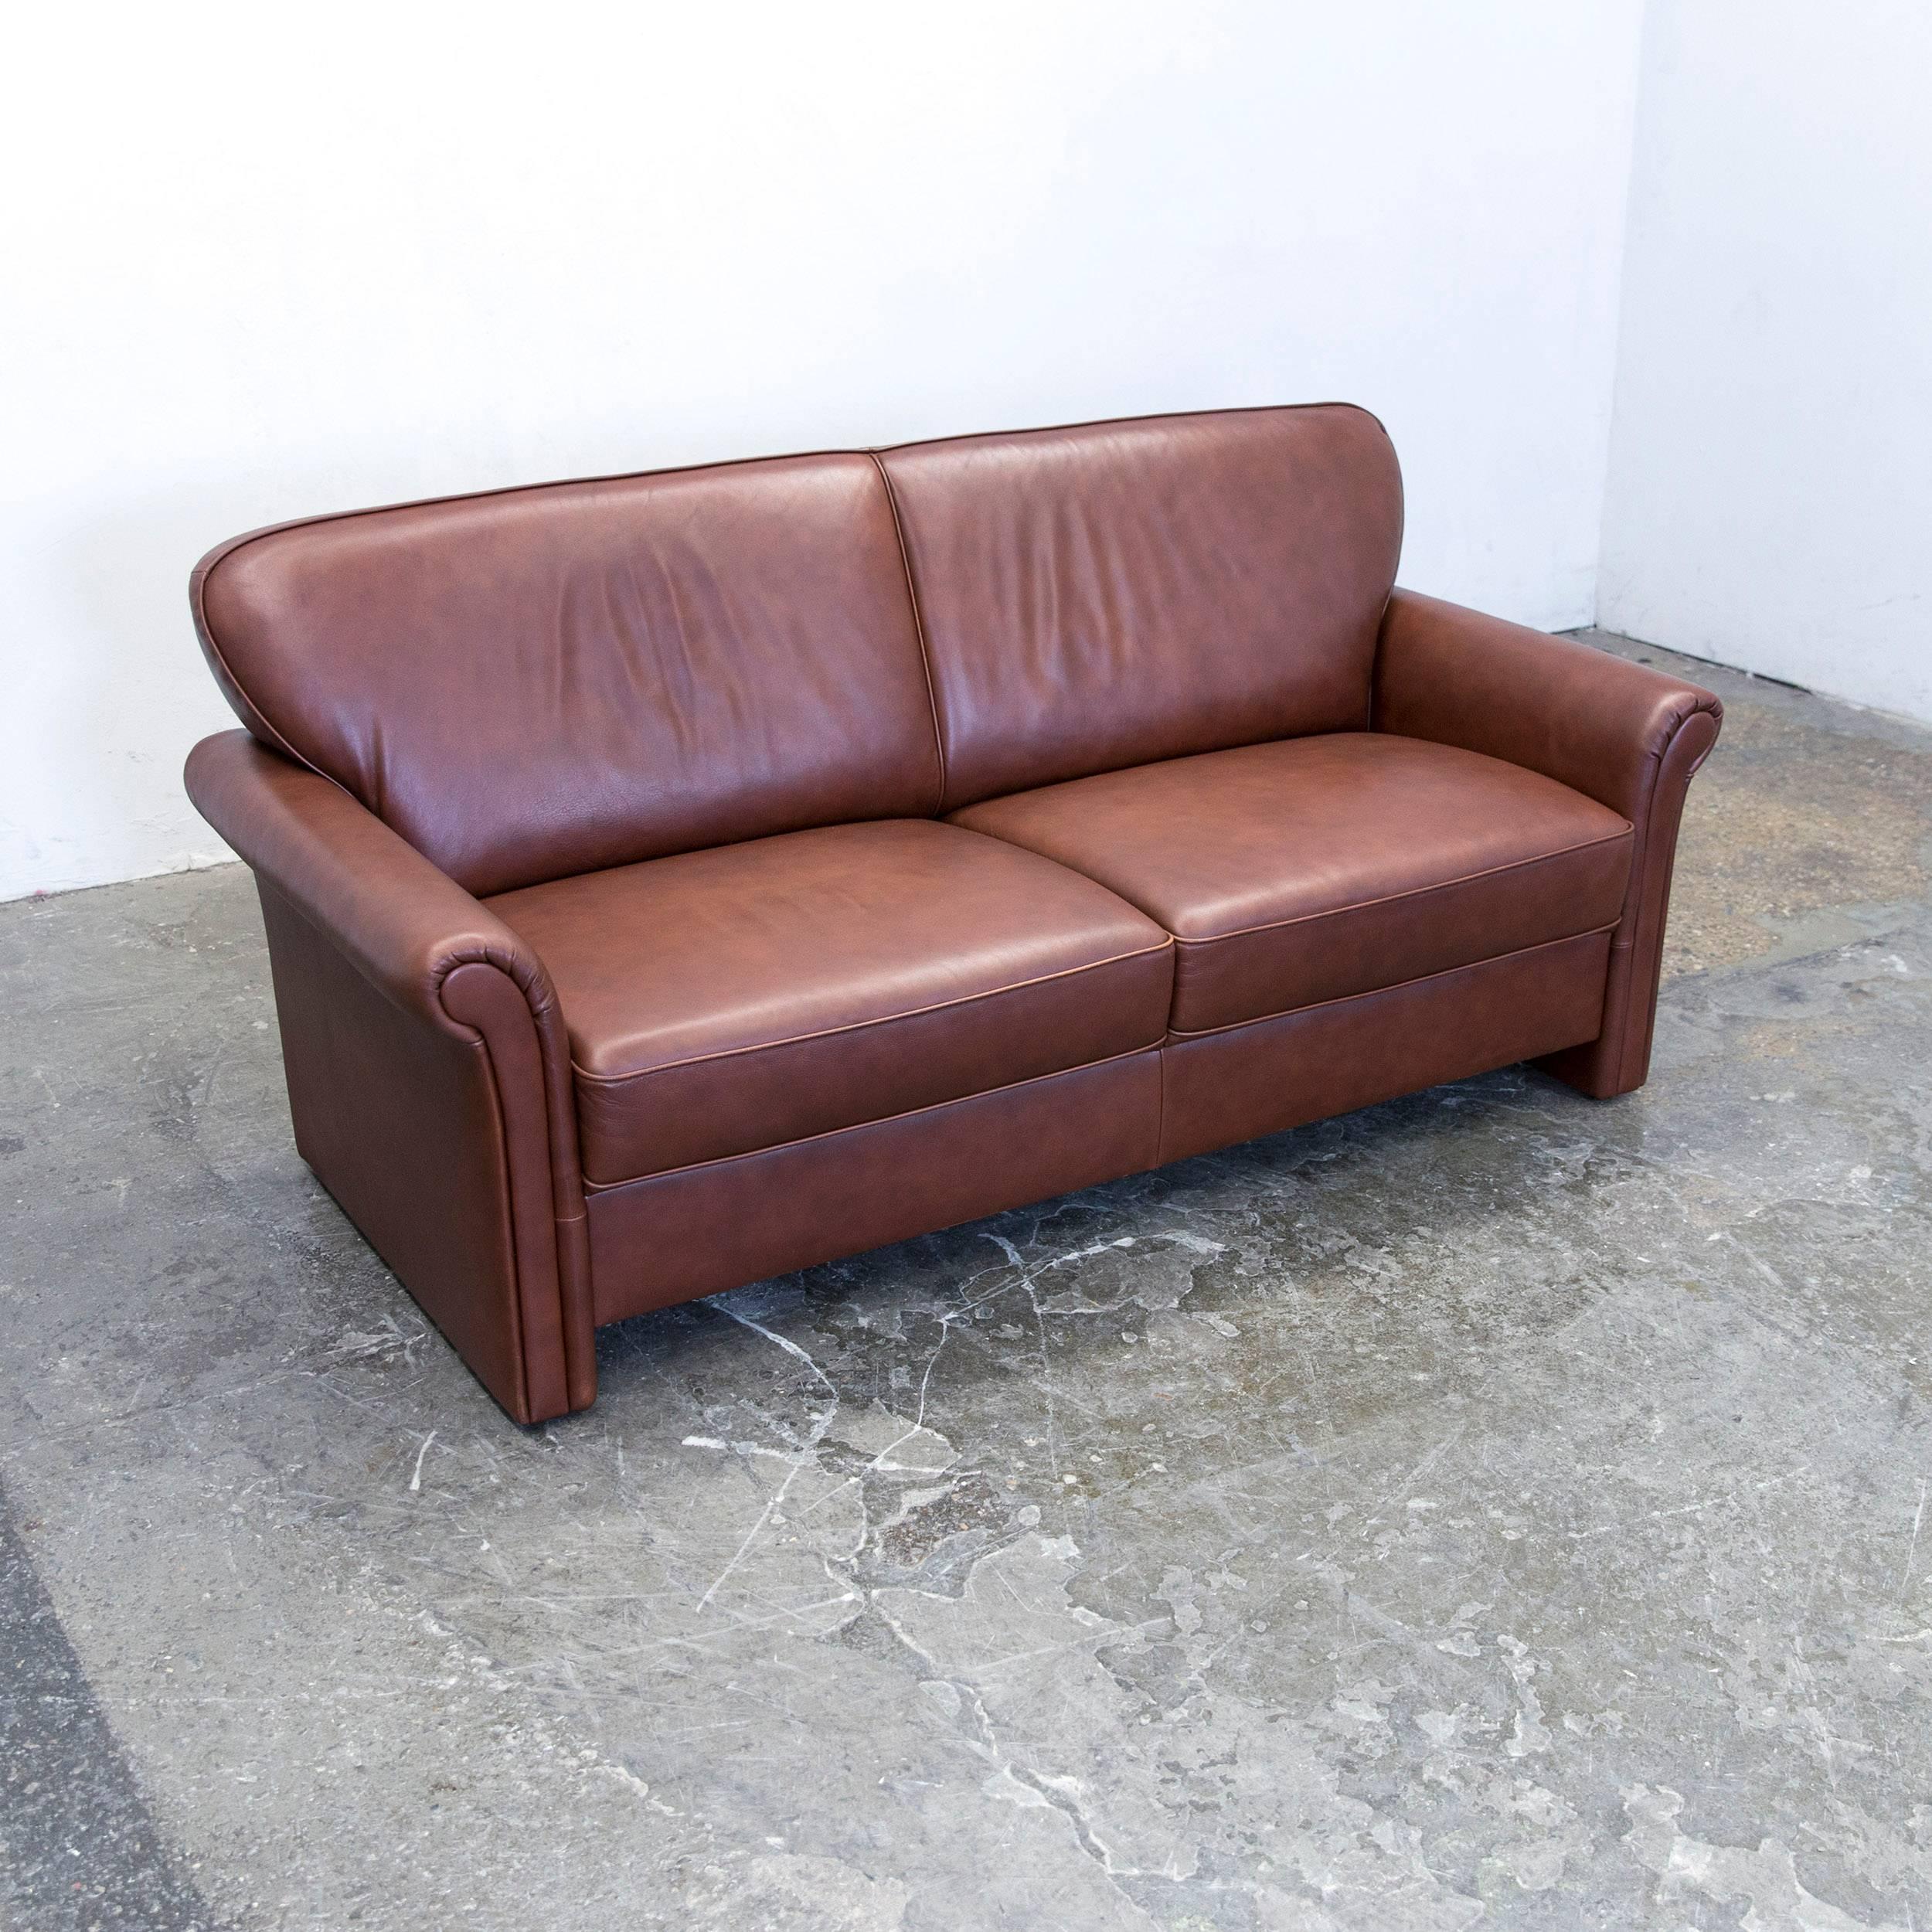 modern sofa kaufen wohndesign. Black Bedroom Furniture Sets. Home Design Ideas